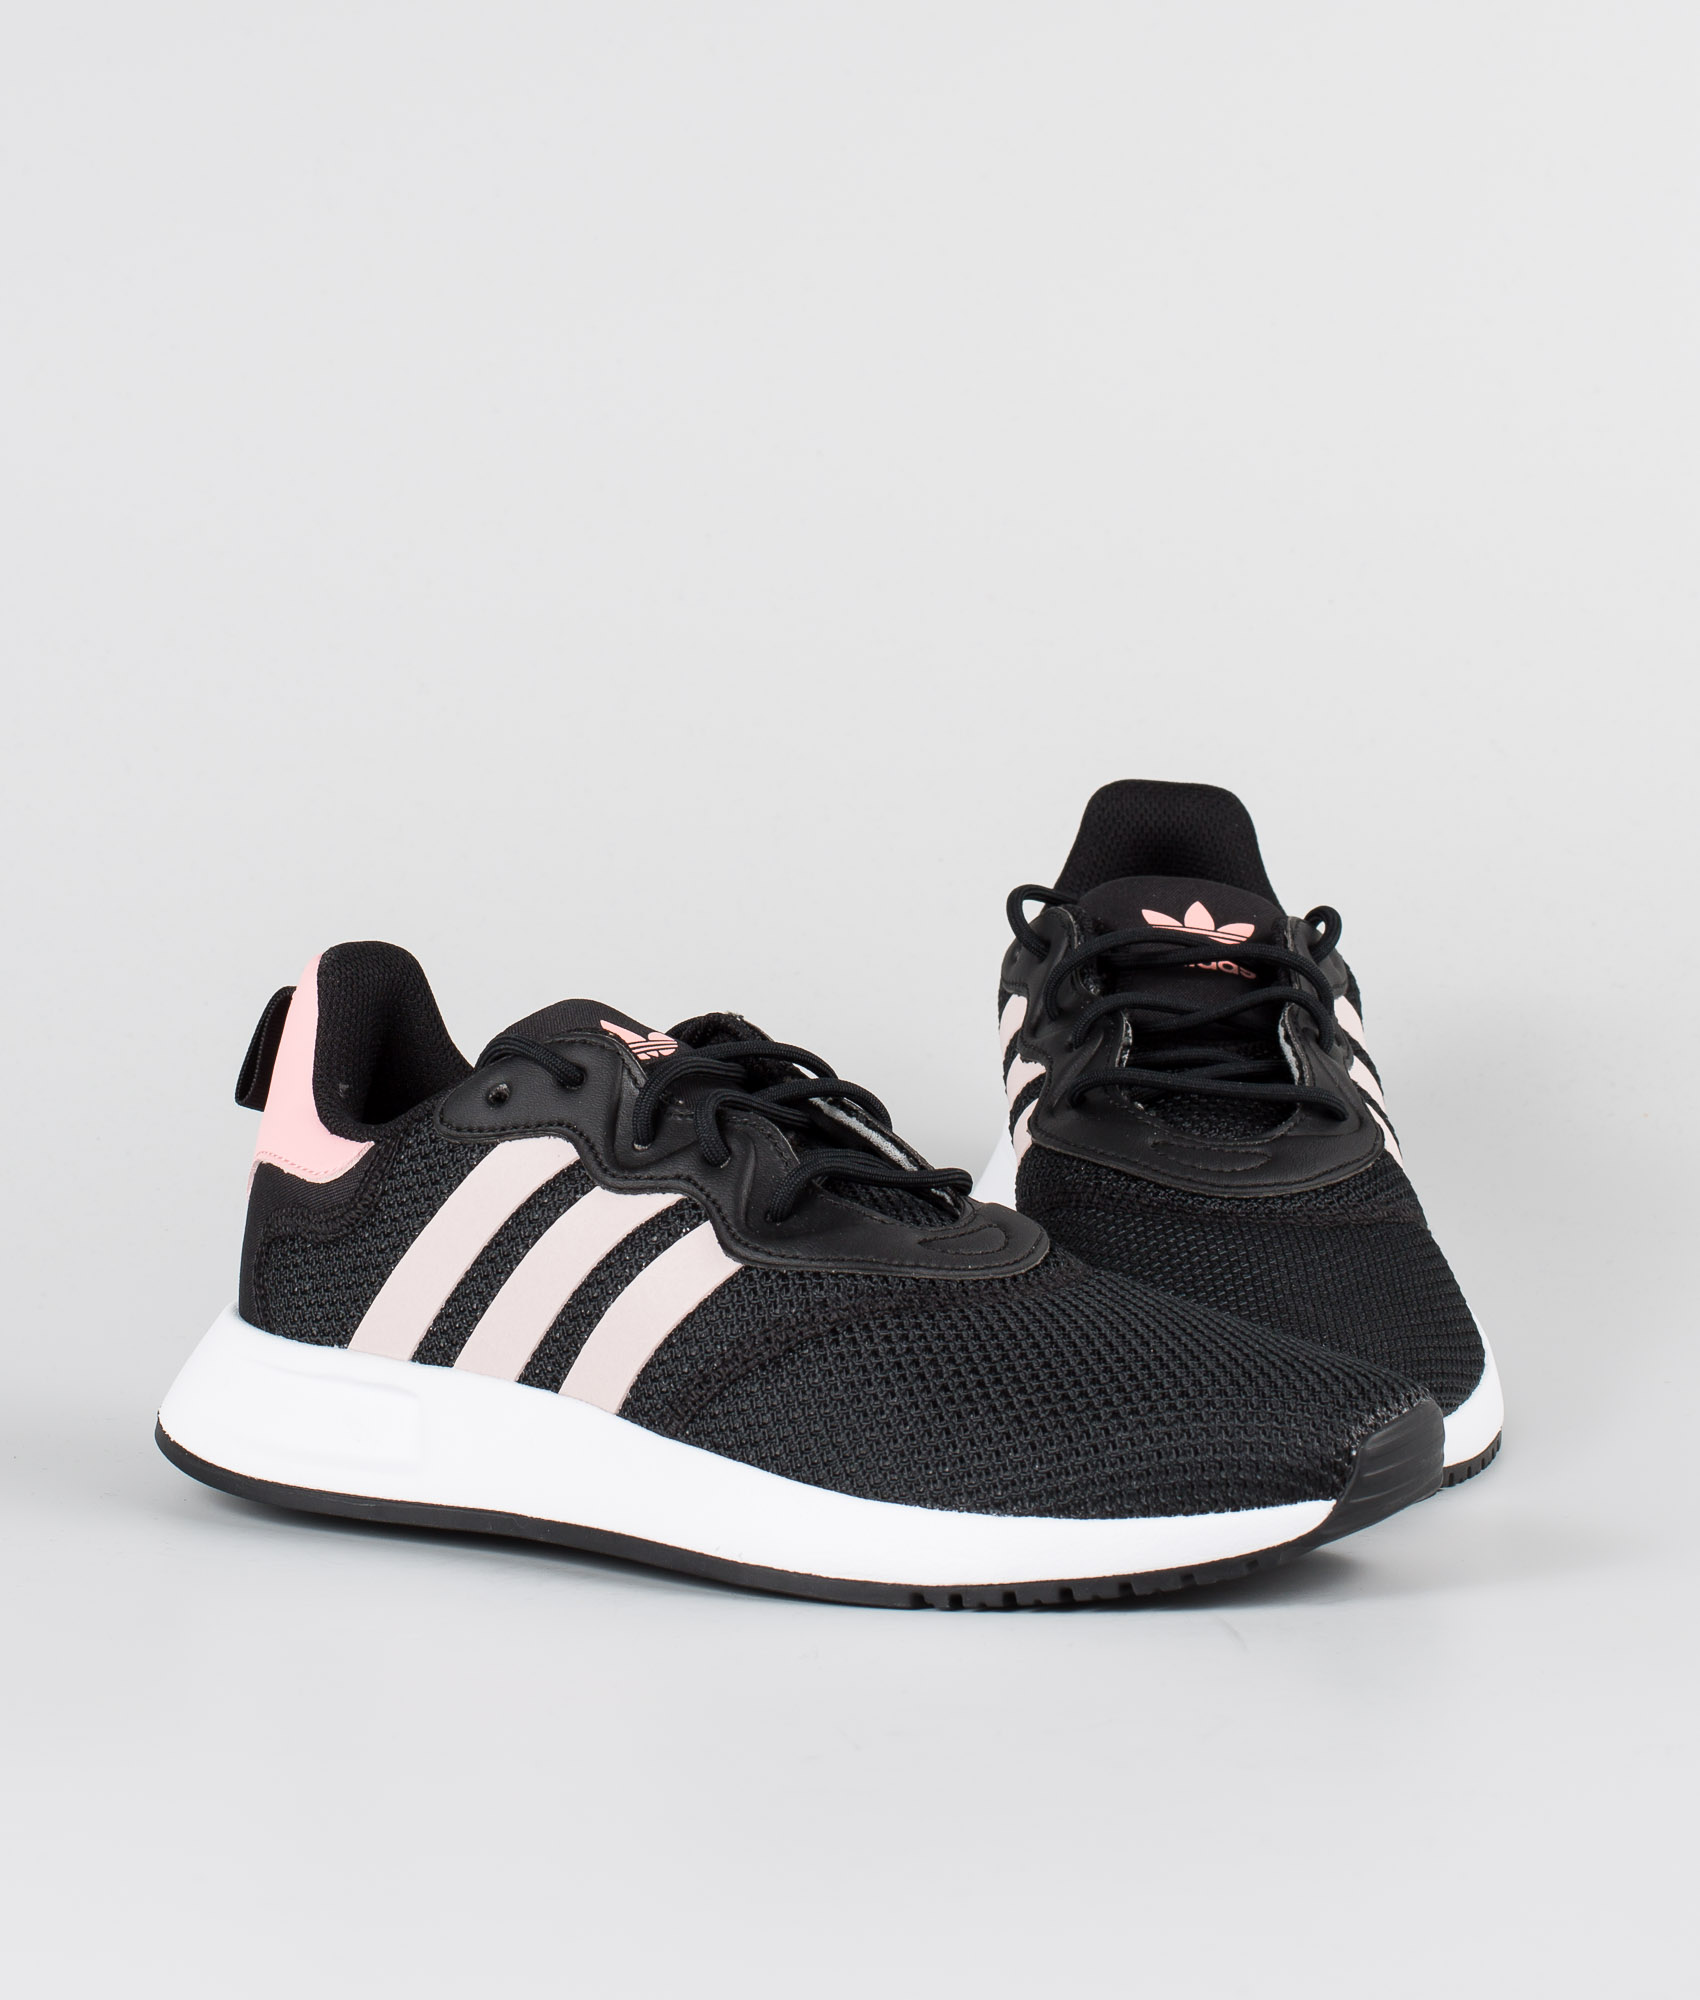 Adidas Originals X_Plr S W Schuhe Core BlackGlopnkFootwear White